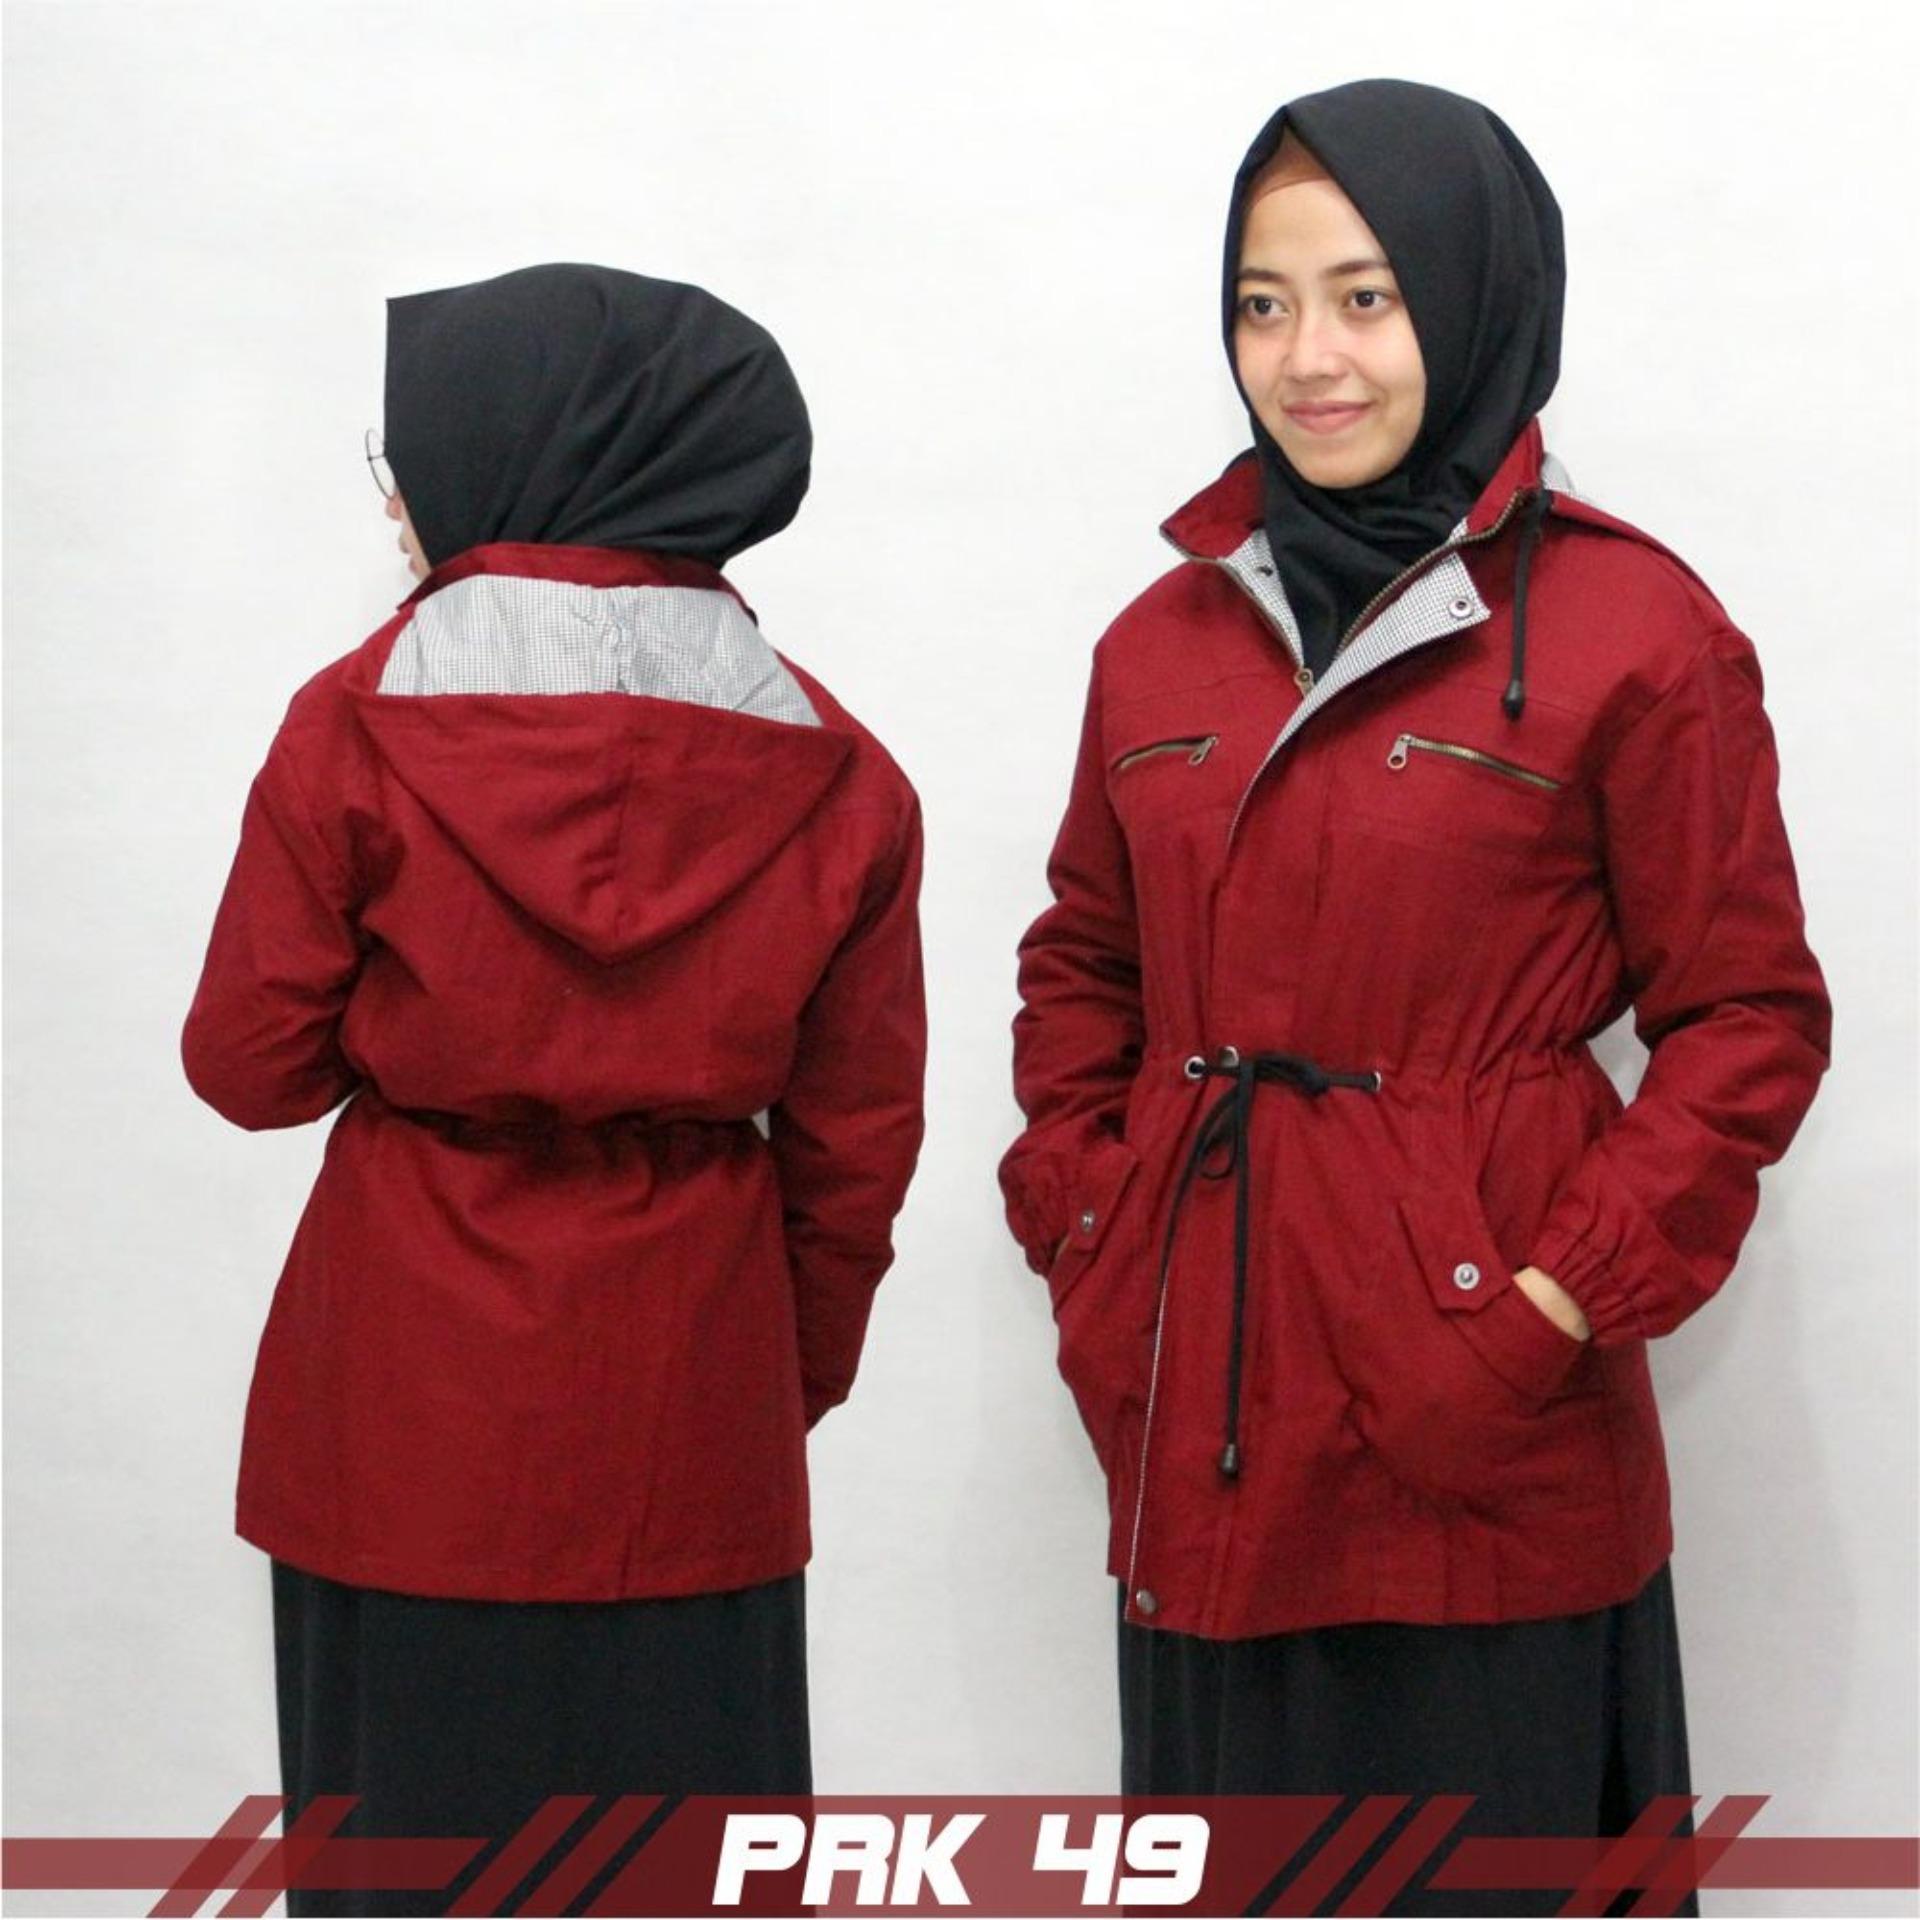 Emdeha Store - TERBARU Jaket Parka Wanita Premium Hoodie Fashionable All Size